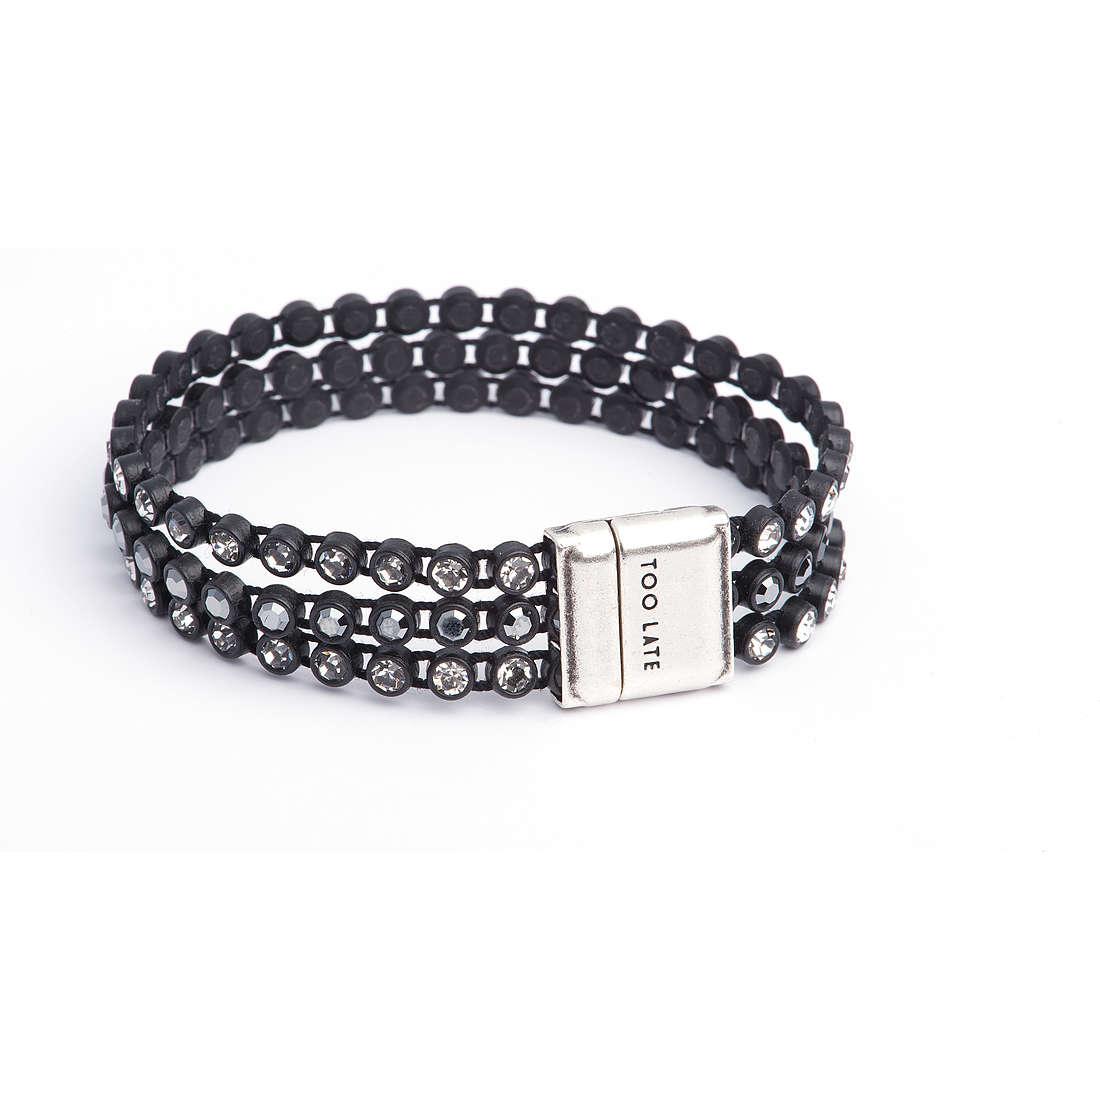 bracelet woman jewellery Too late 8052745221808